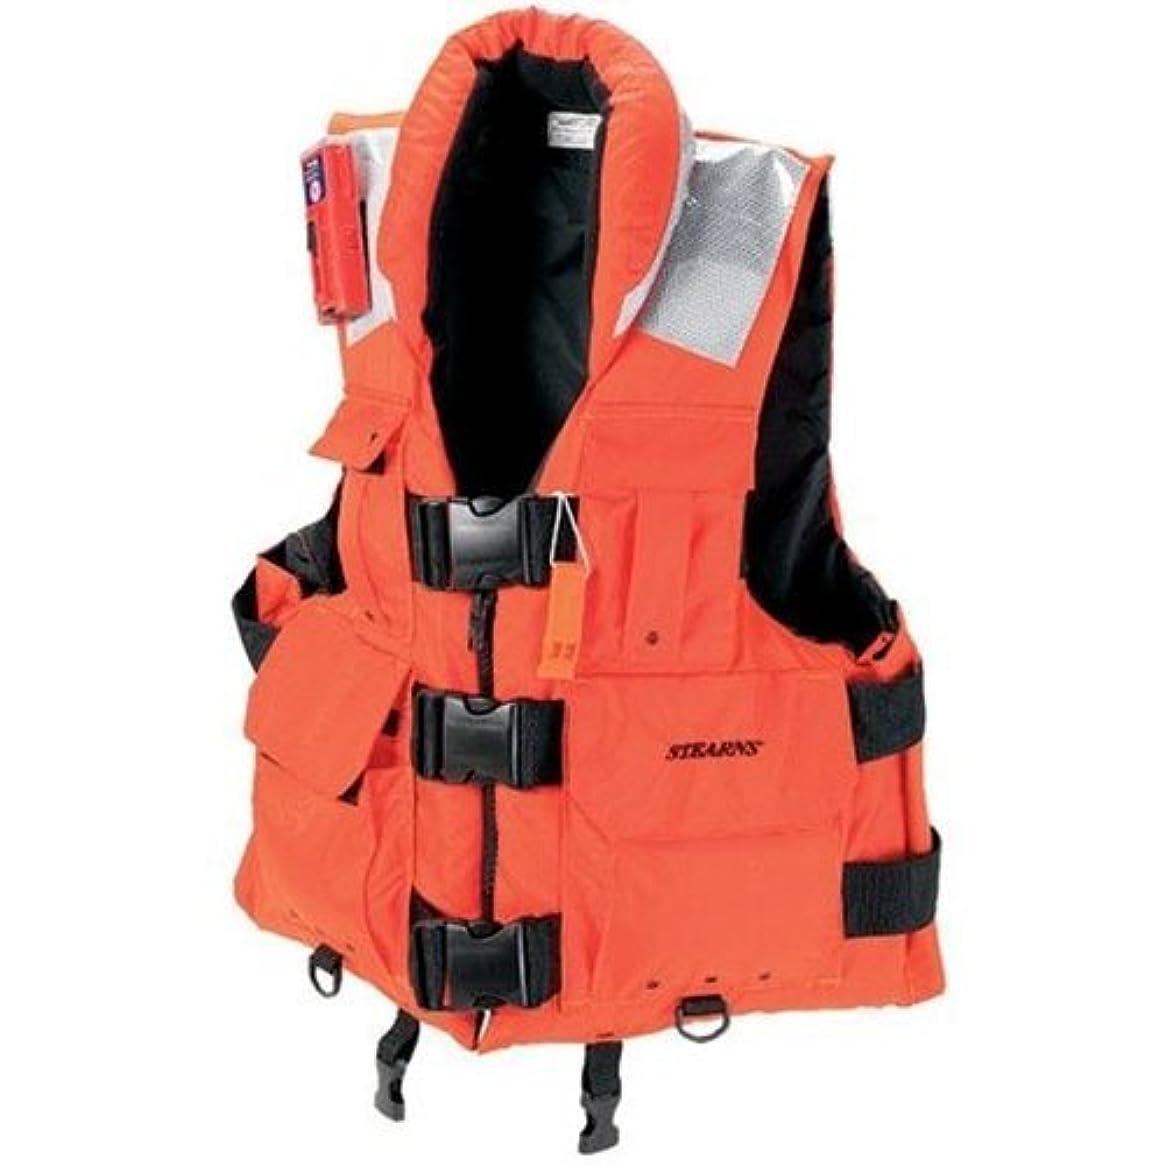 Stearns Type III SAR Professional Life Jacket, Orange